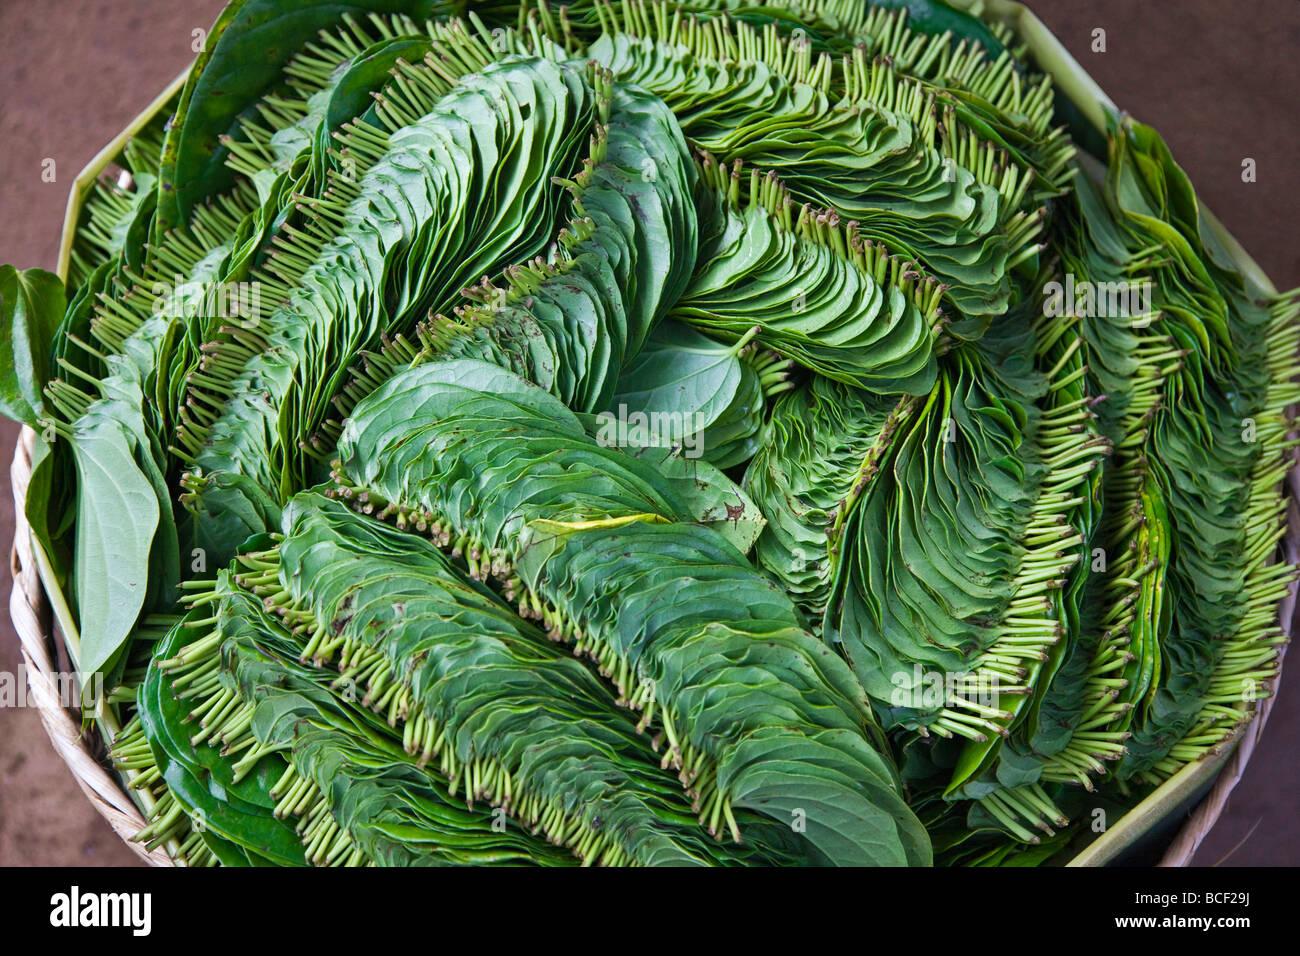 Myanmar, Burma, Lake Inle. Betel leaves carefully packed in a basket at Phaung Daw Oo market. - Stock Image